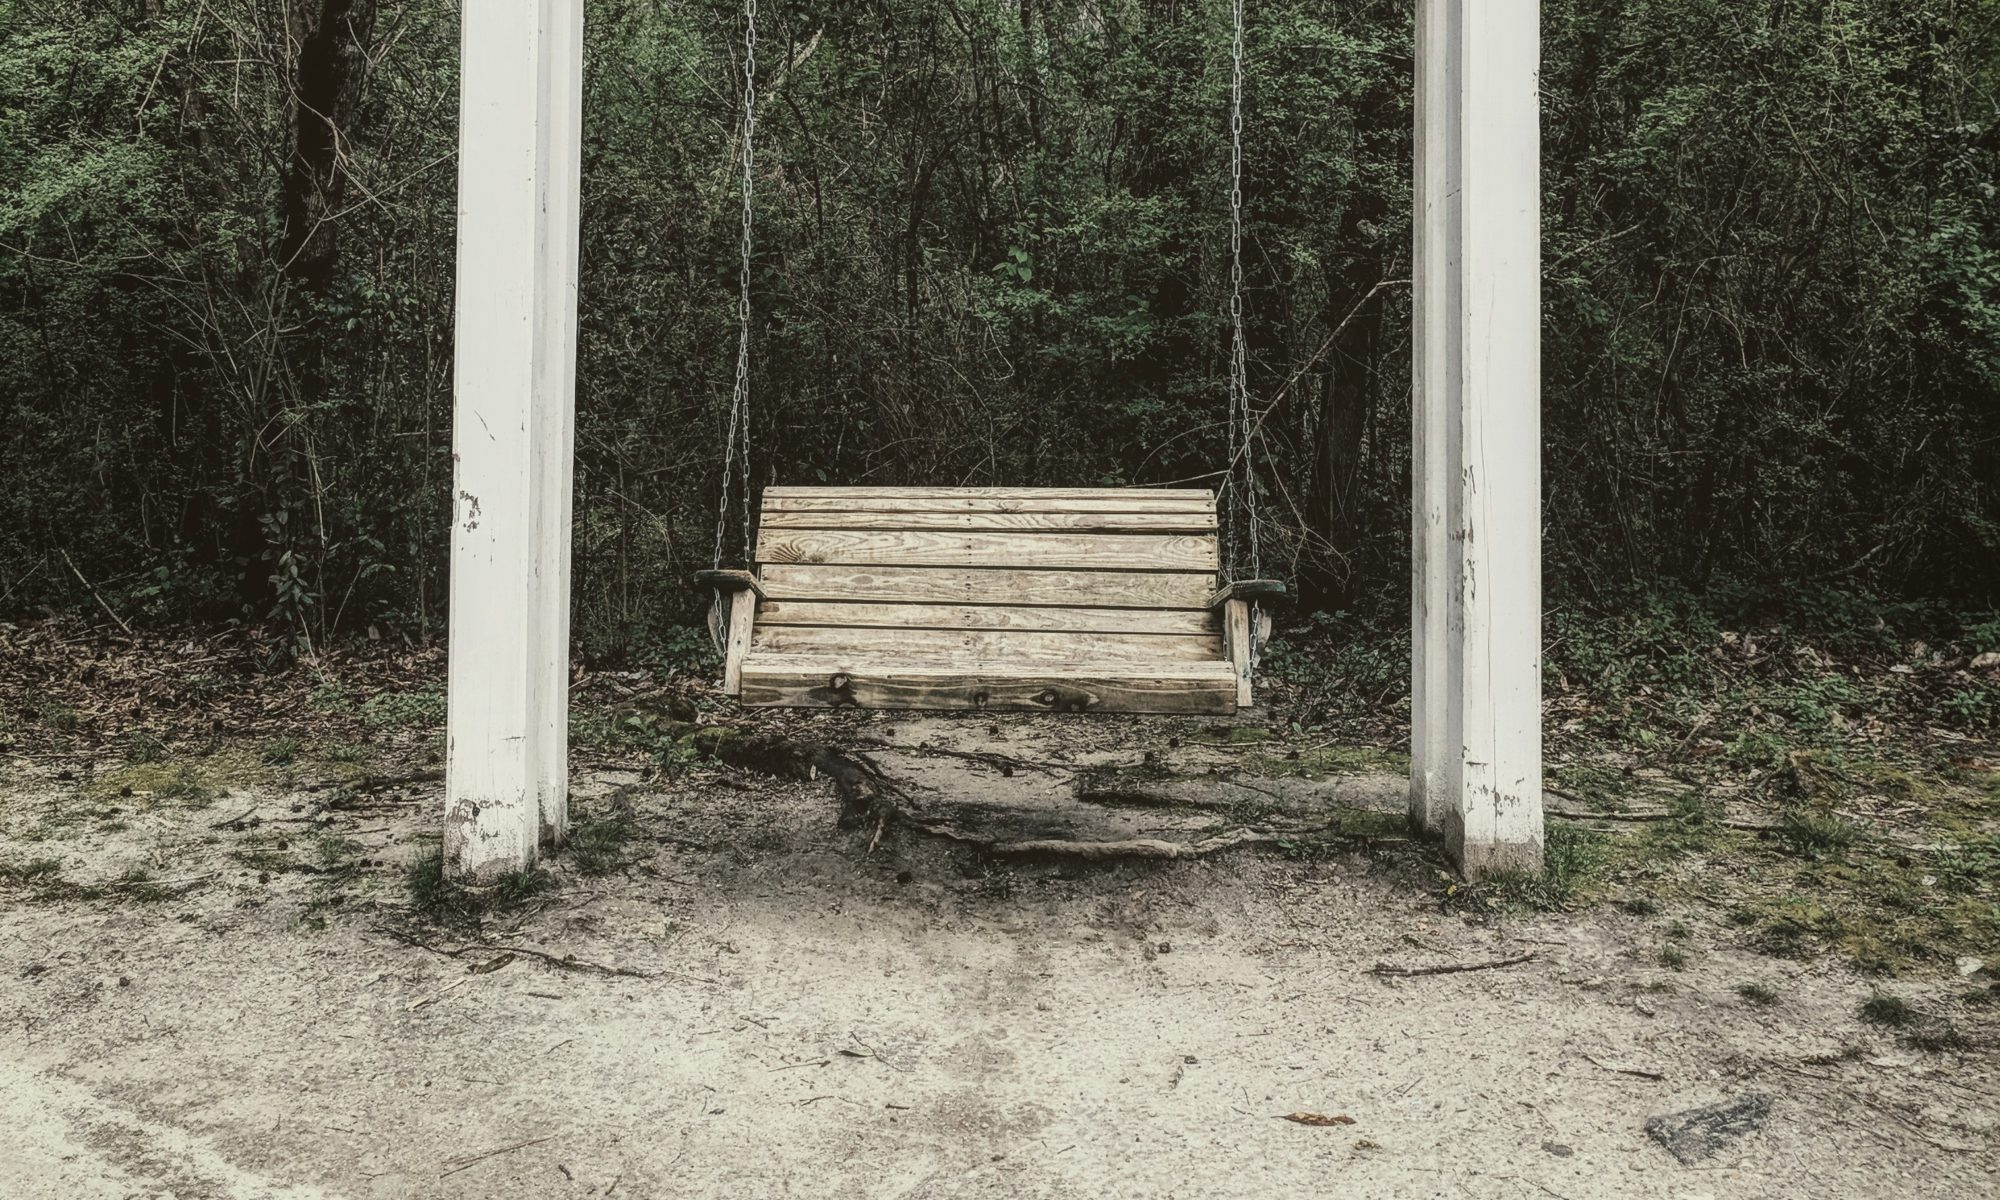 Empty porch swing.